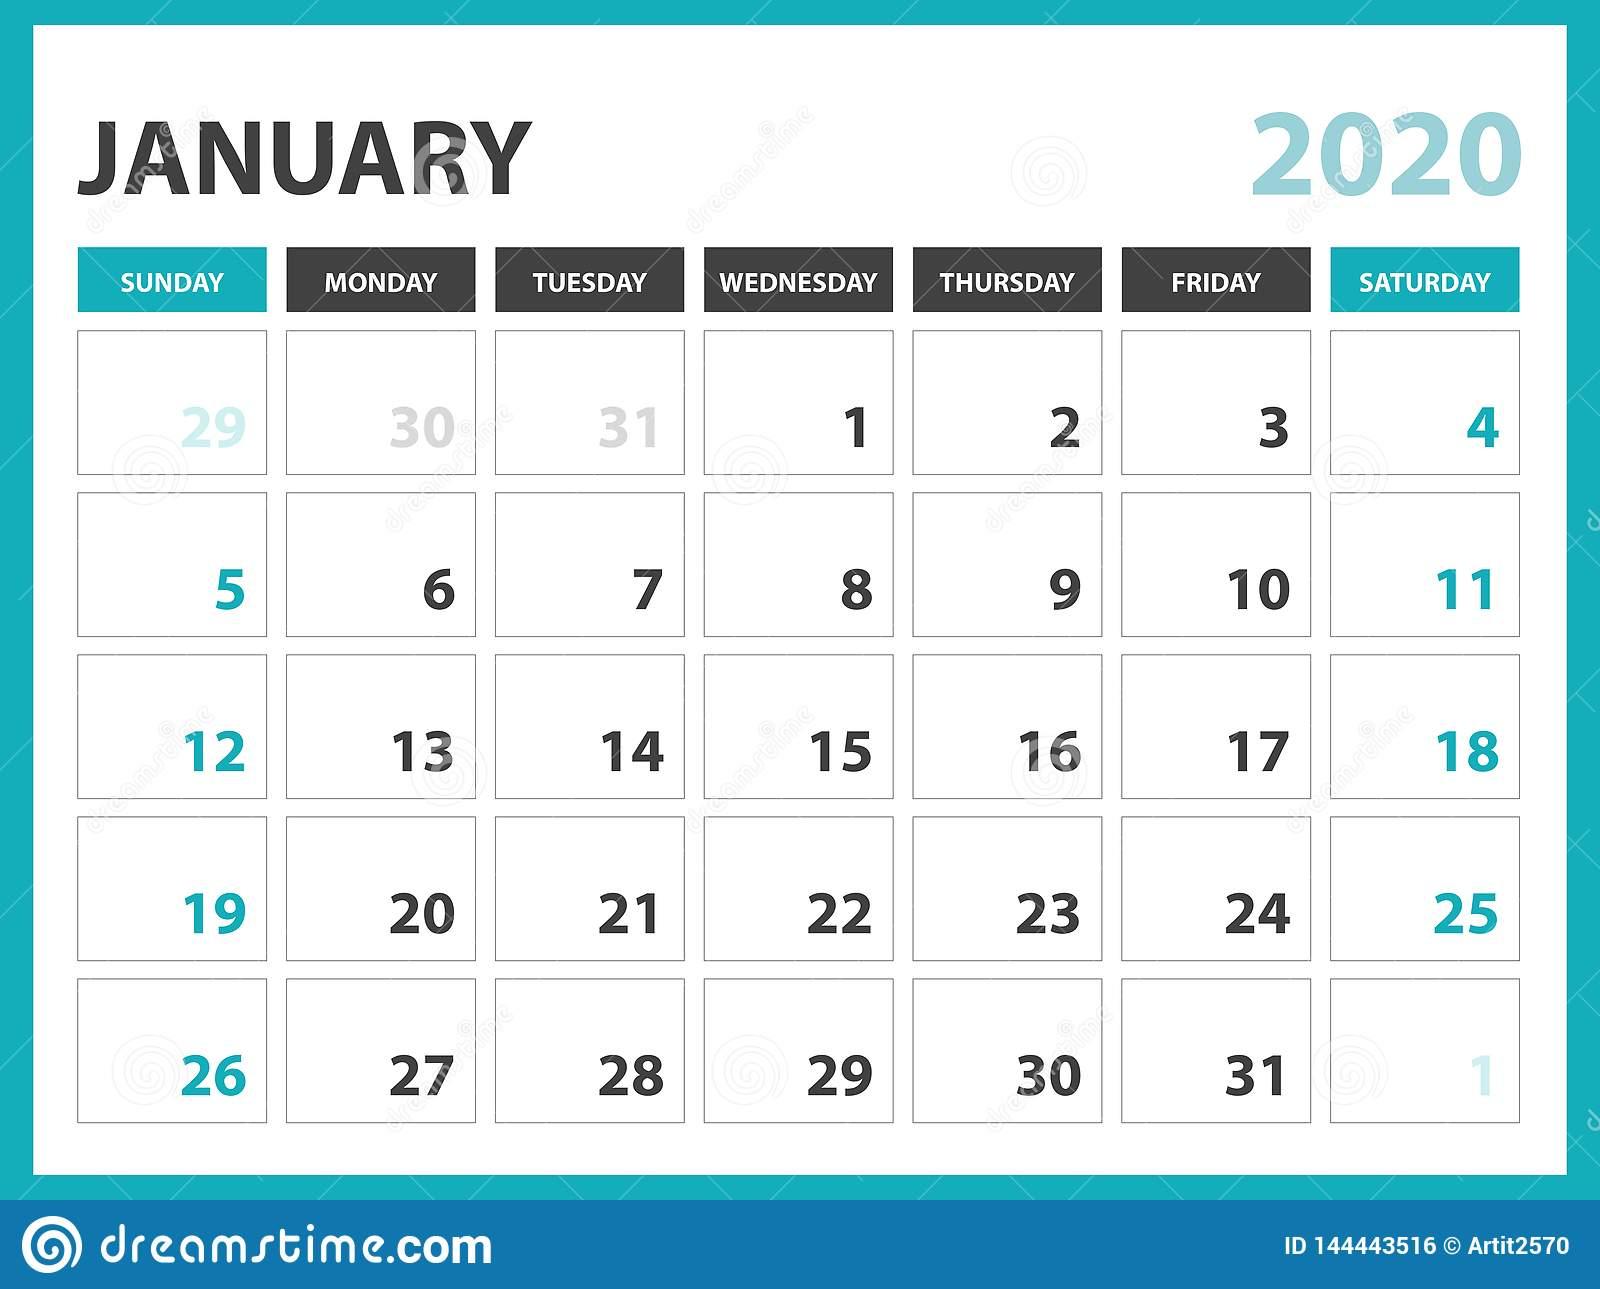 Desk Calendar Layout Size 8 X 6 Inch, January 2020 Calendar intended for January 2020 Calendar Starting Monday